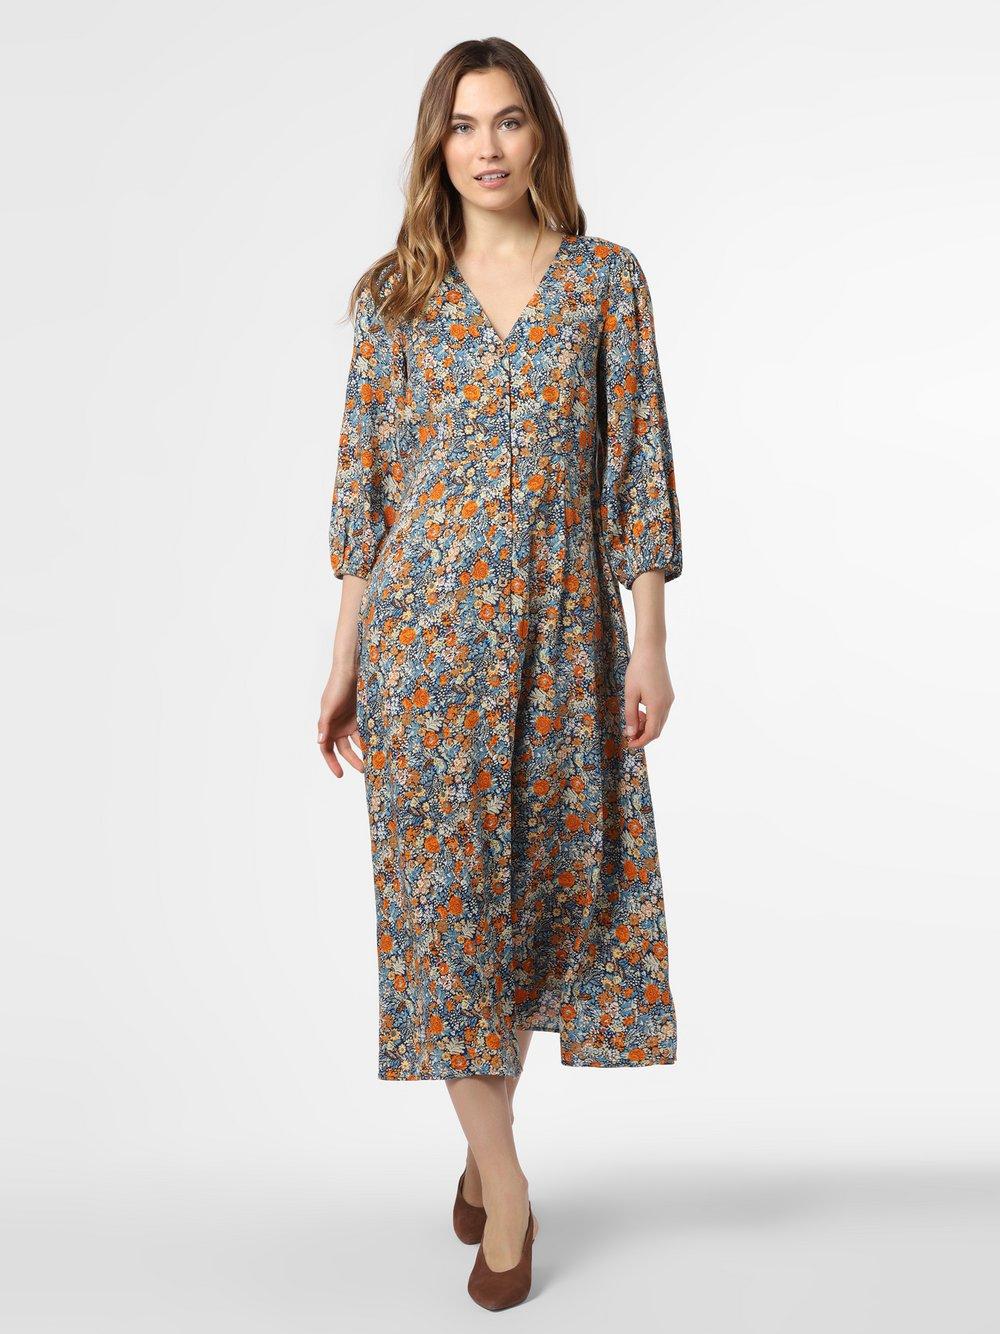 Y.A.S - Sukienka damska – Yaspepitas, niebieski